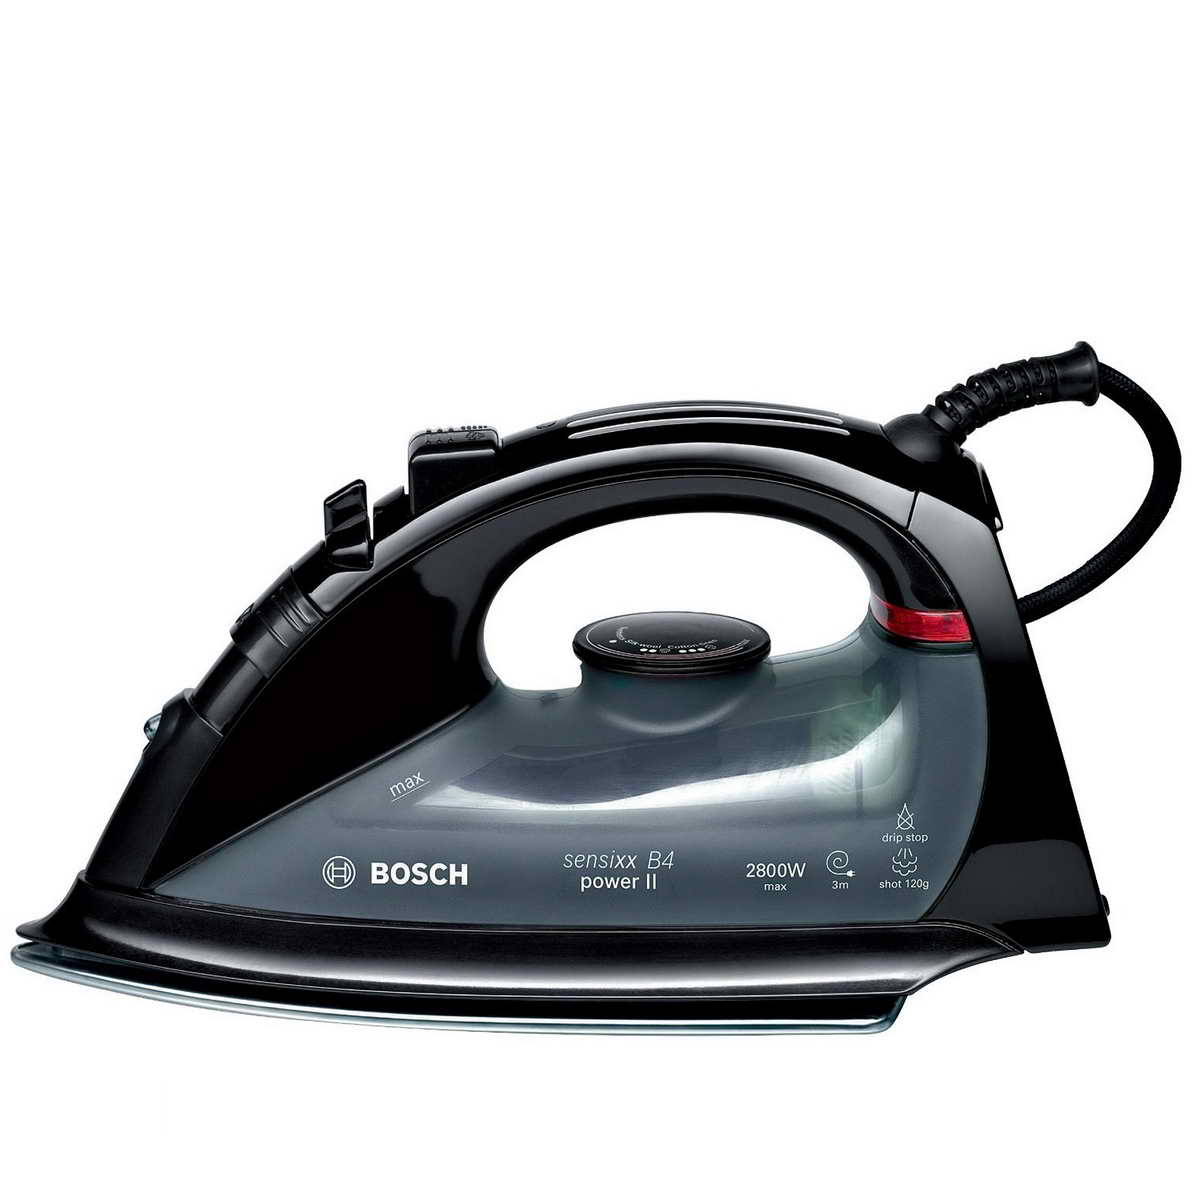 Bosch Sensixx B4 Power Ii Steam Iron Tda5620gb Around